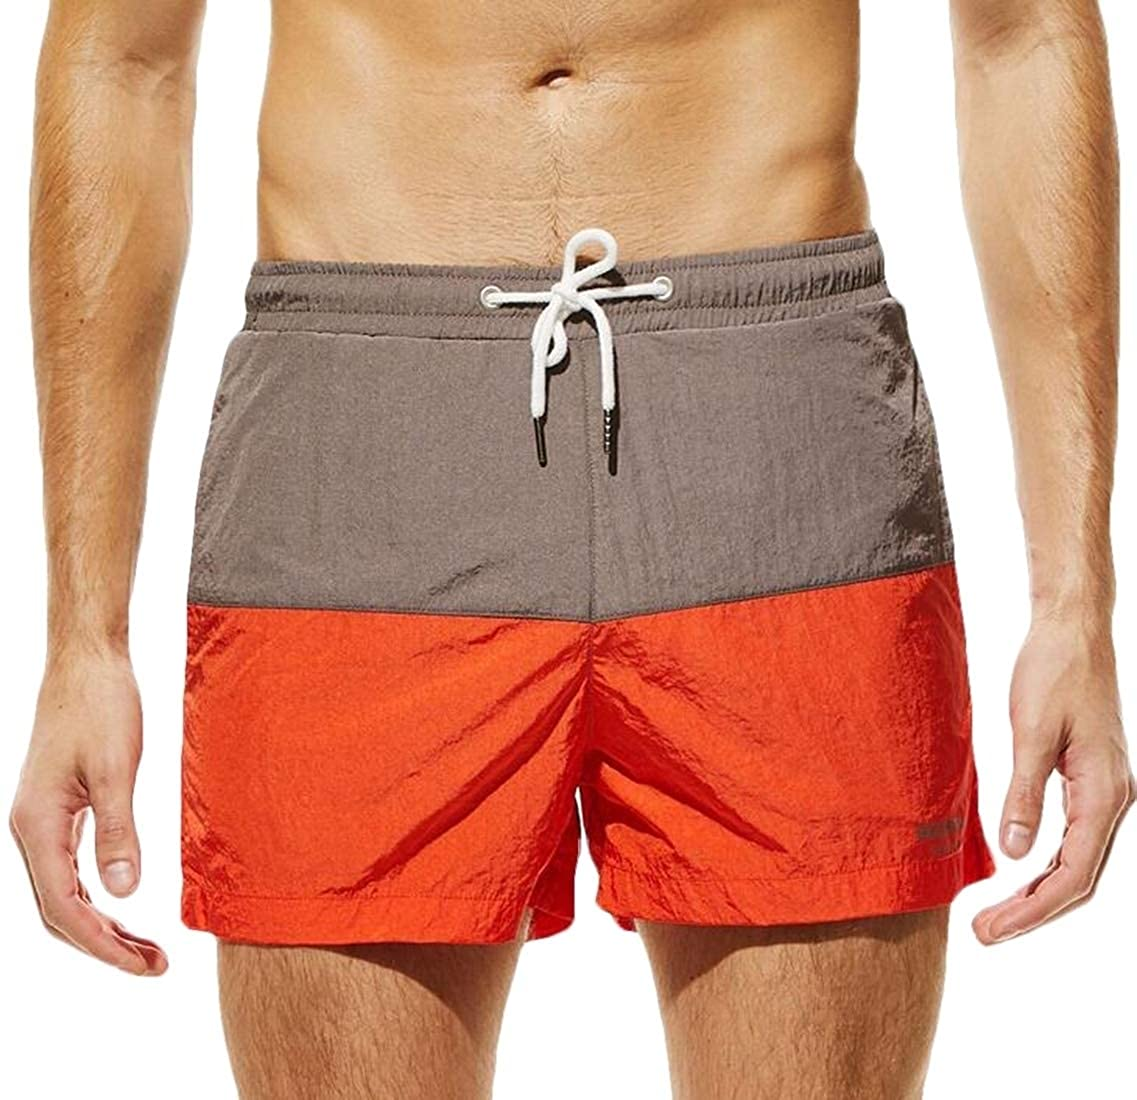 MU2M Men Swim Trunk Contrast Lightweight Quick Dry Beach Swim Trunk Boardshorts